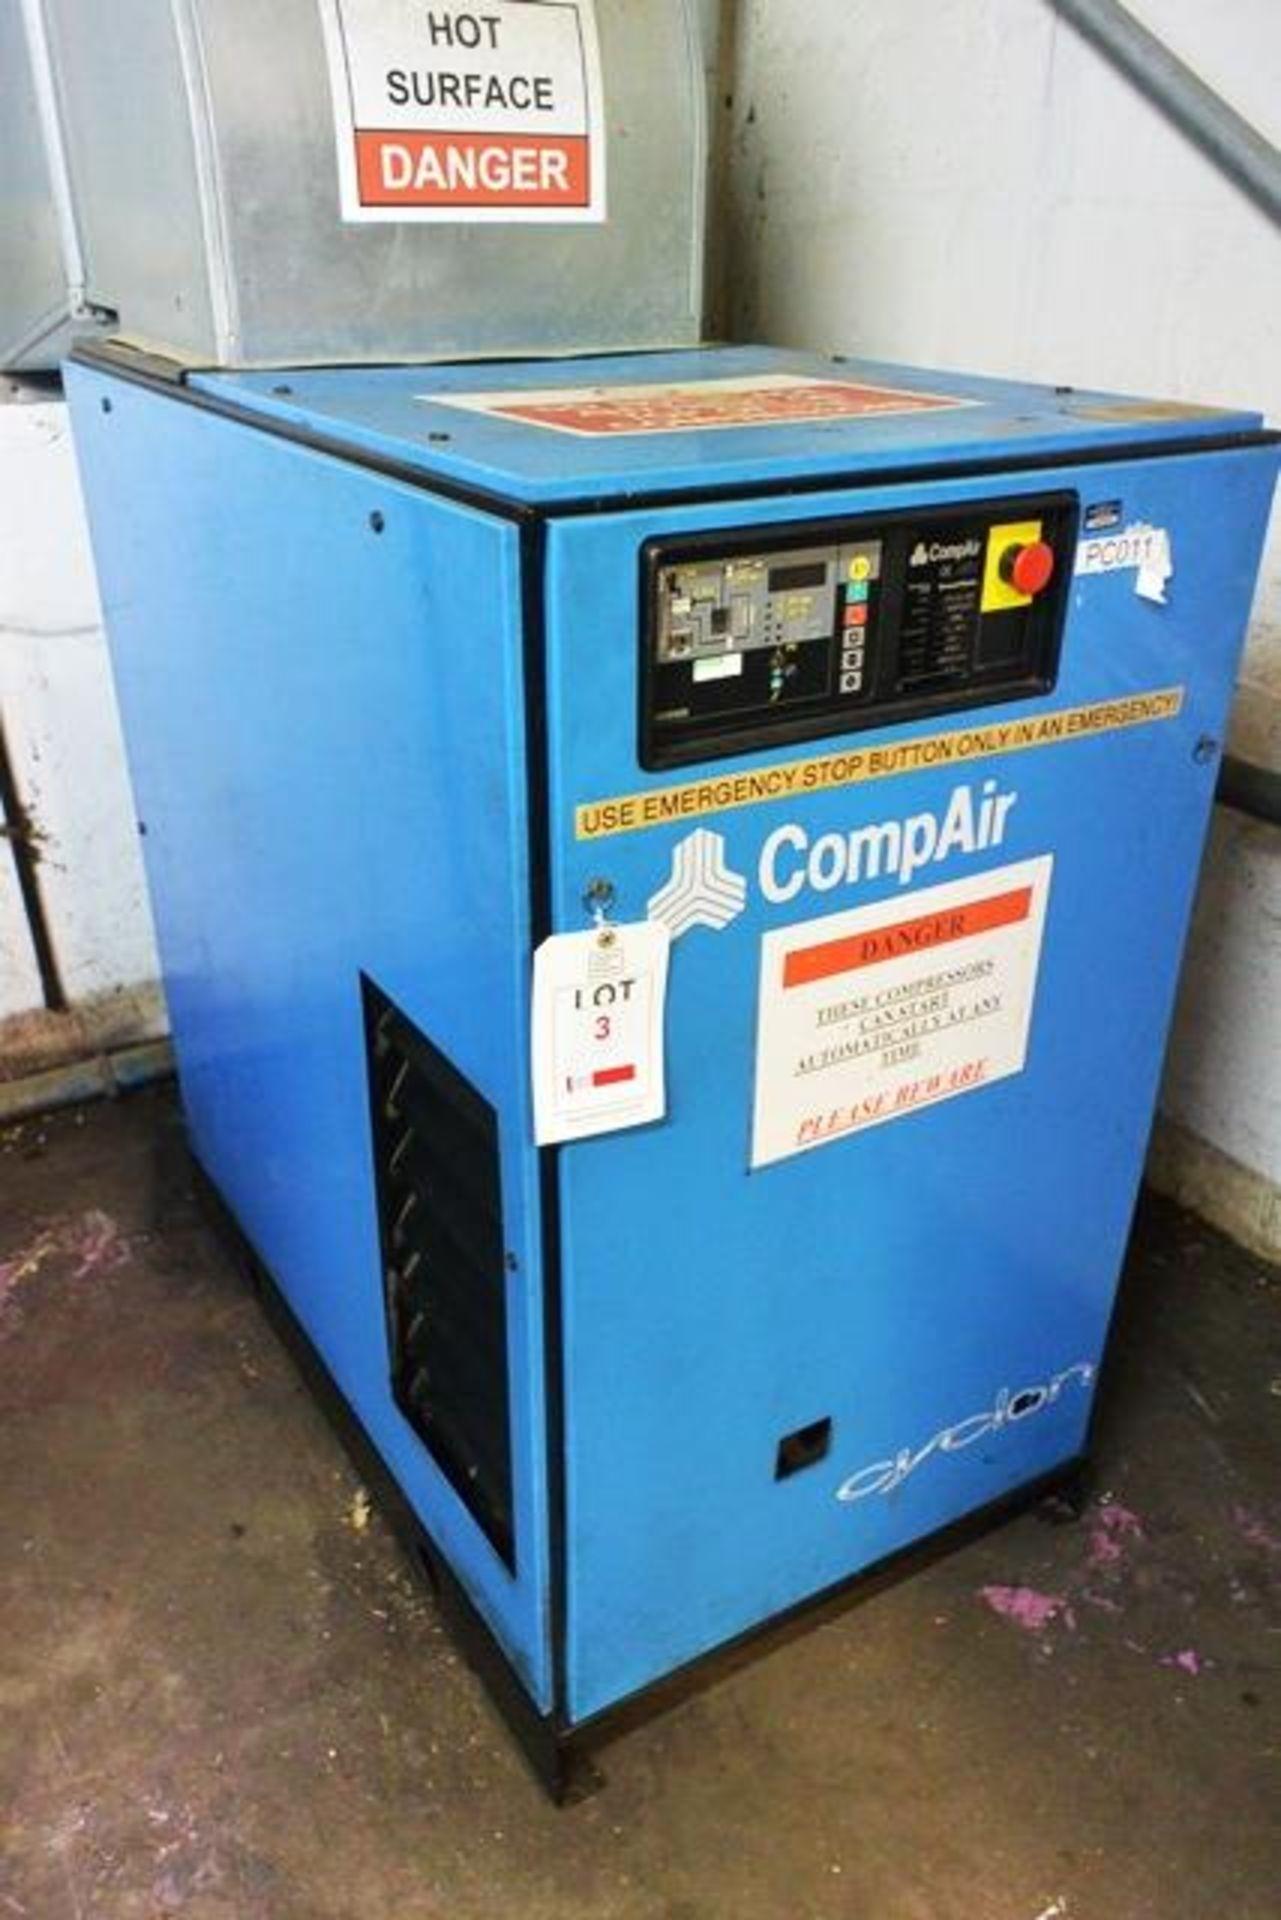 Compair Cyclon 218 air compressor, serial no. F164/0833 (1996), 7.5 bar, 22.1kw, 3 phase, Last...